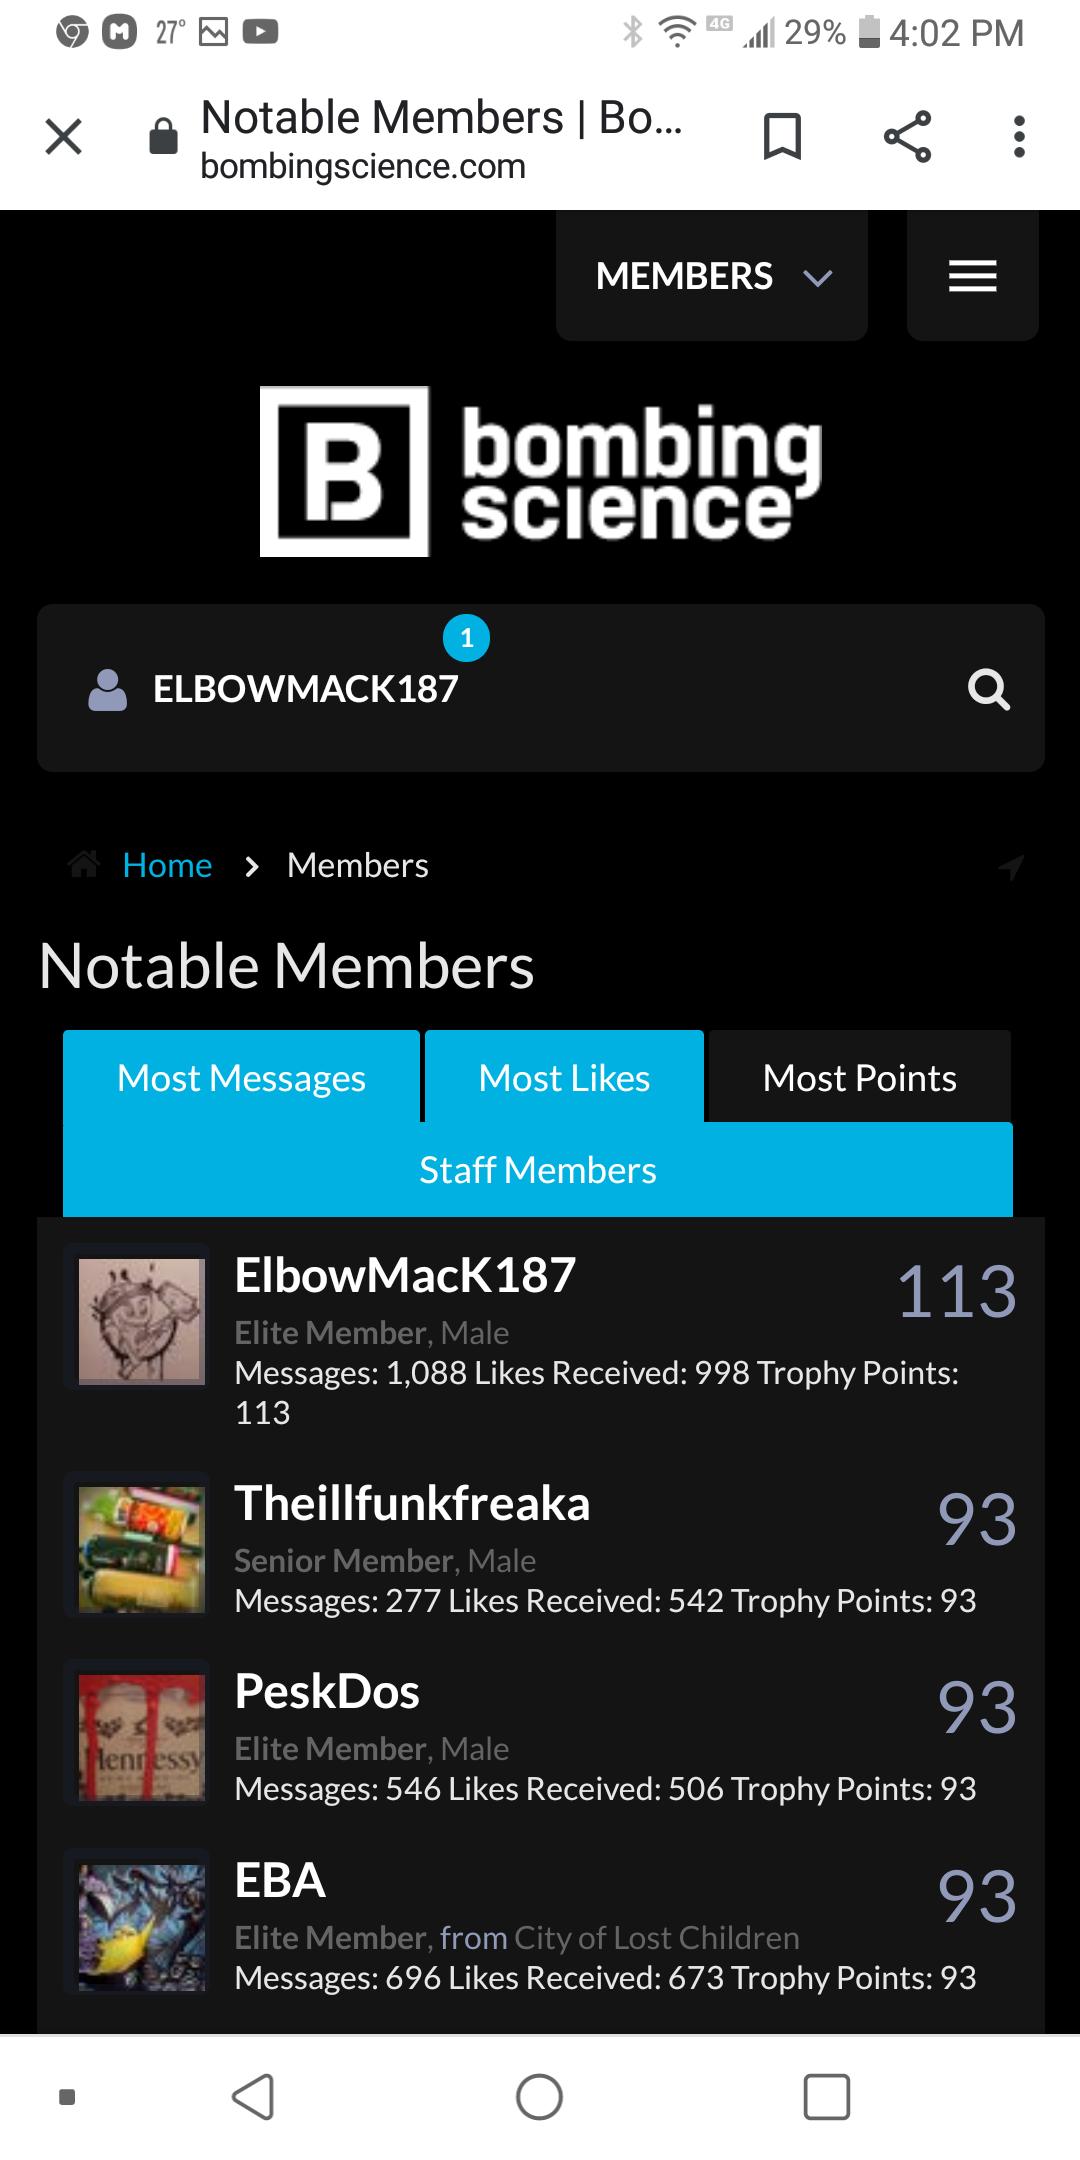 Screenshot_2019-12-17-16-02-23.png